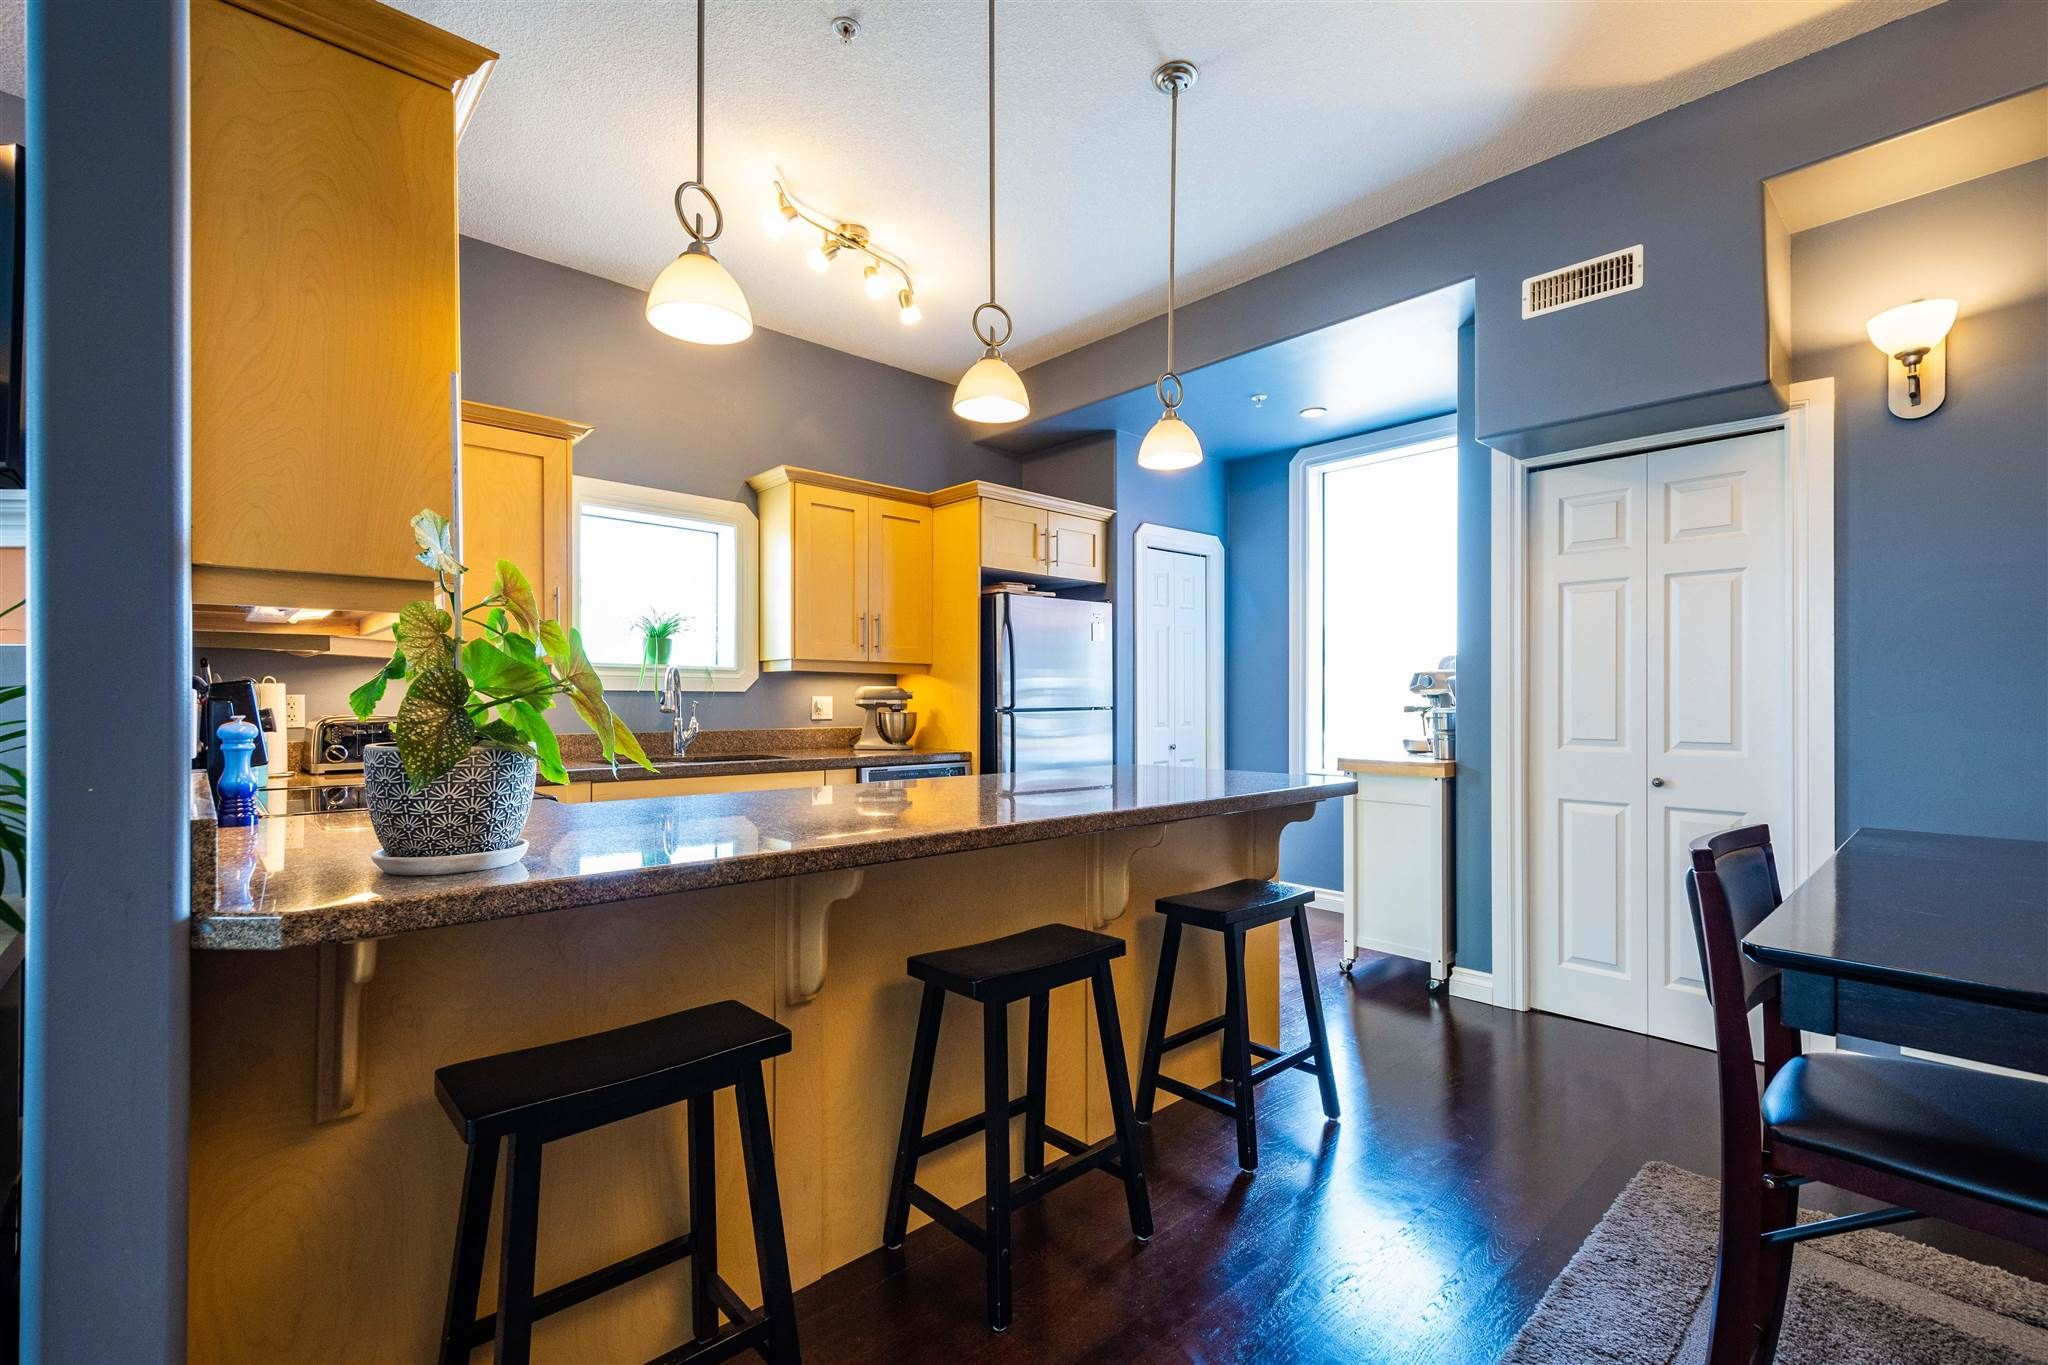 Main Photo: 201 10625 KINGSWAY Avenue in Edmonton: Zone 08 Condo for sale : MLS®# E4254794